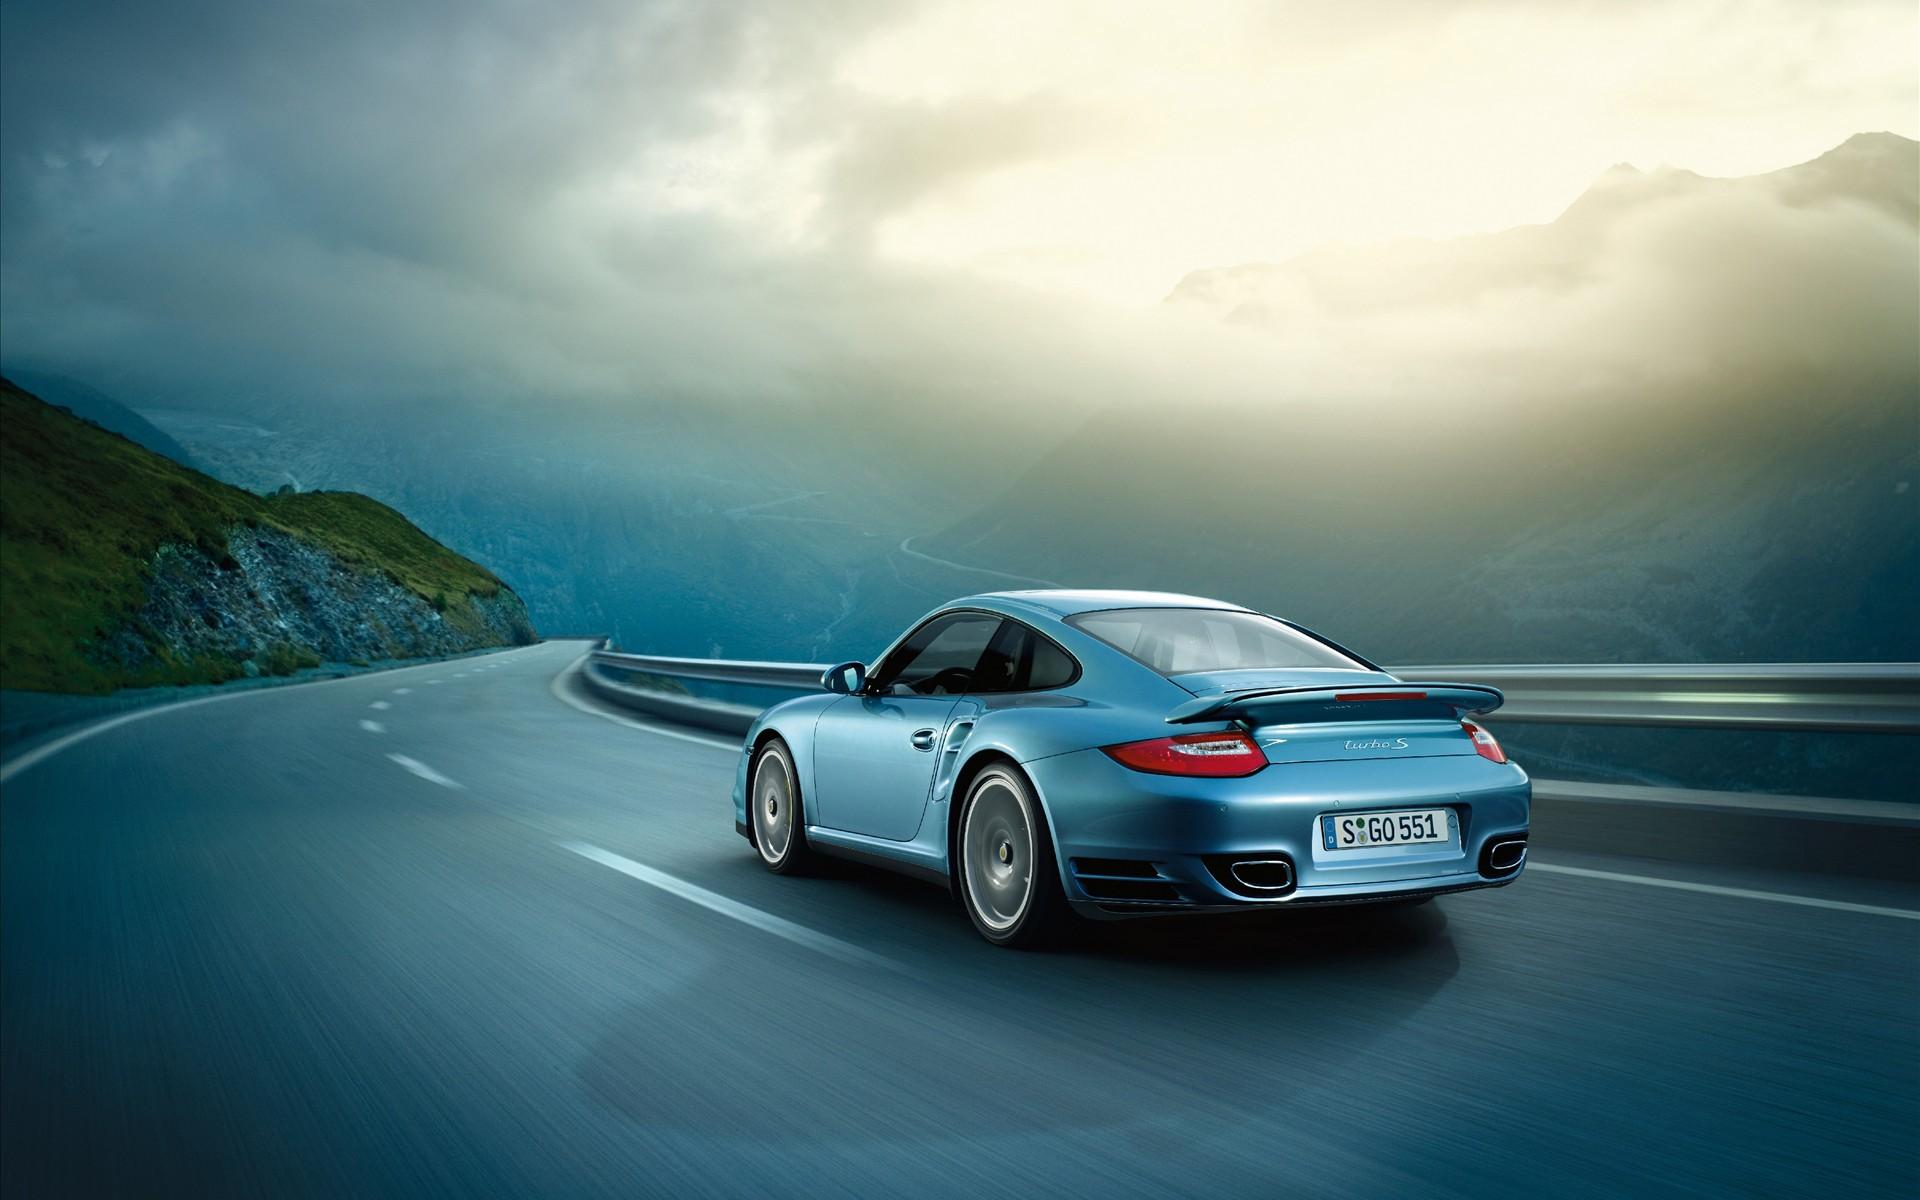 2011 porsche 911 turbo s 2 wallpapers hd wallpapers